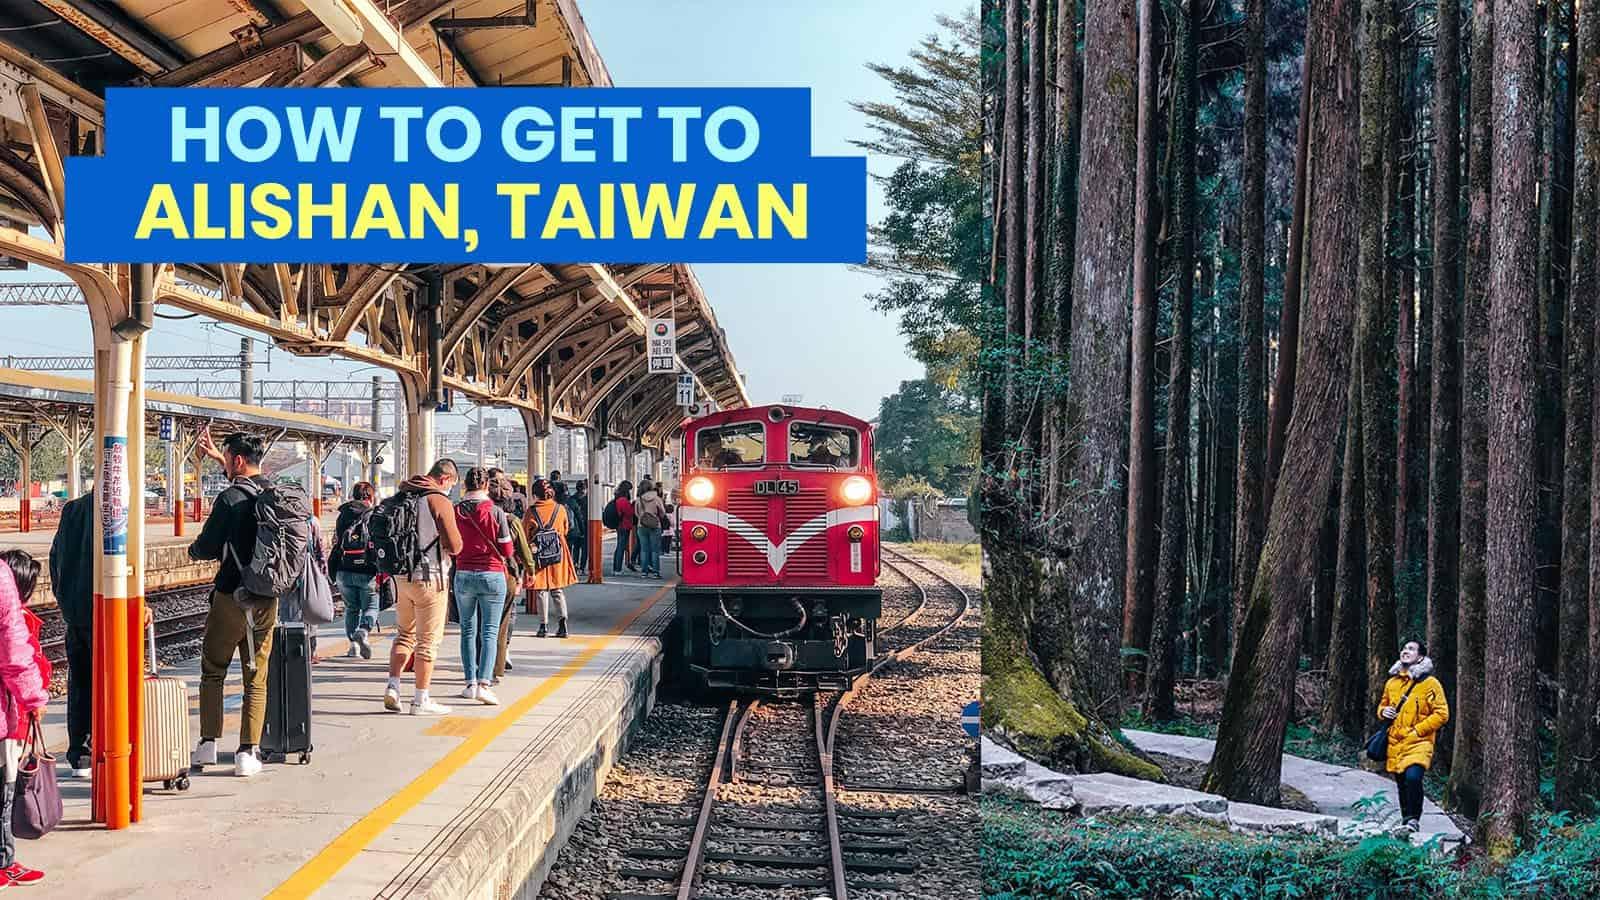 CHIAYI TO ALISHAN by Alishan Express Train & Bus: Schedule & Fare